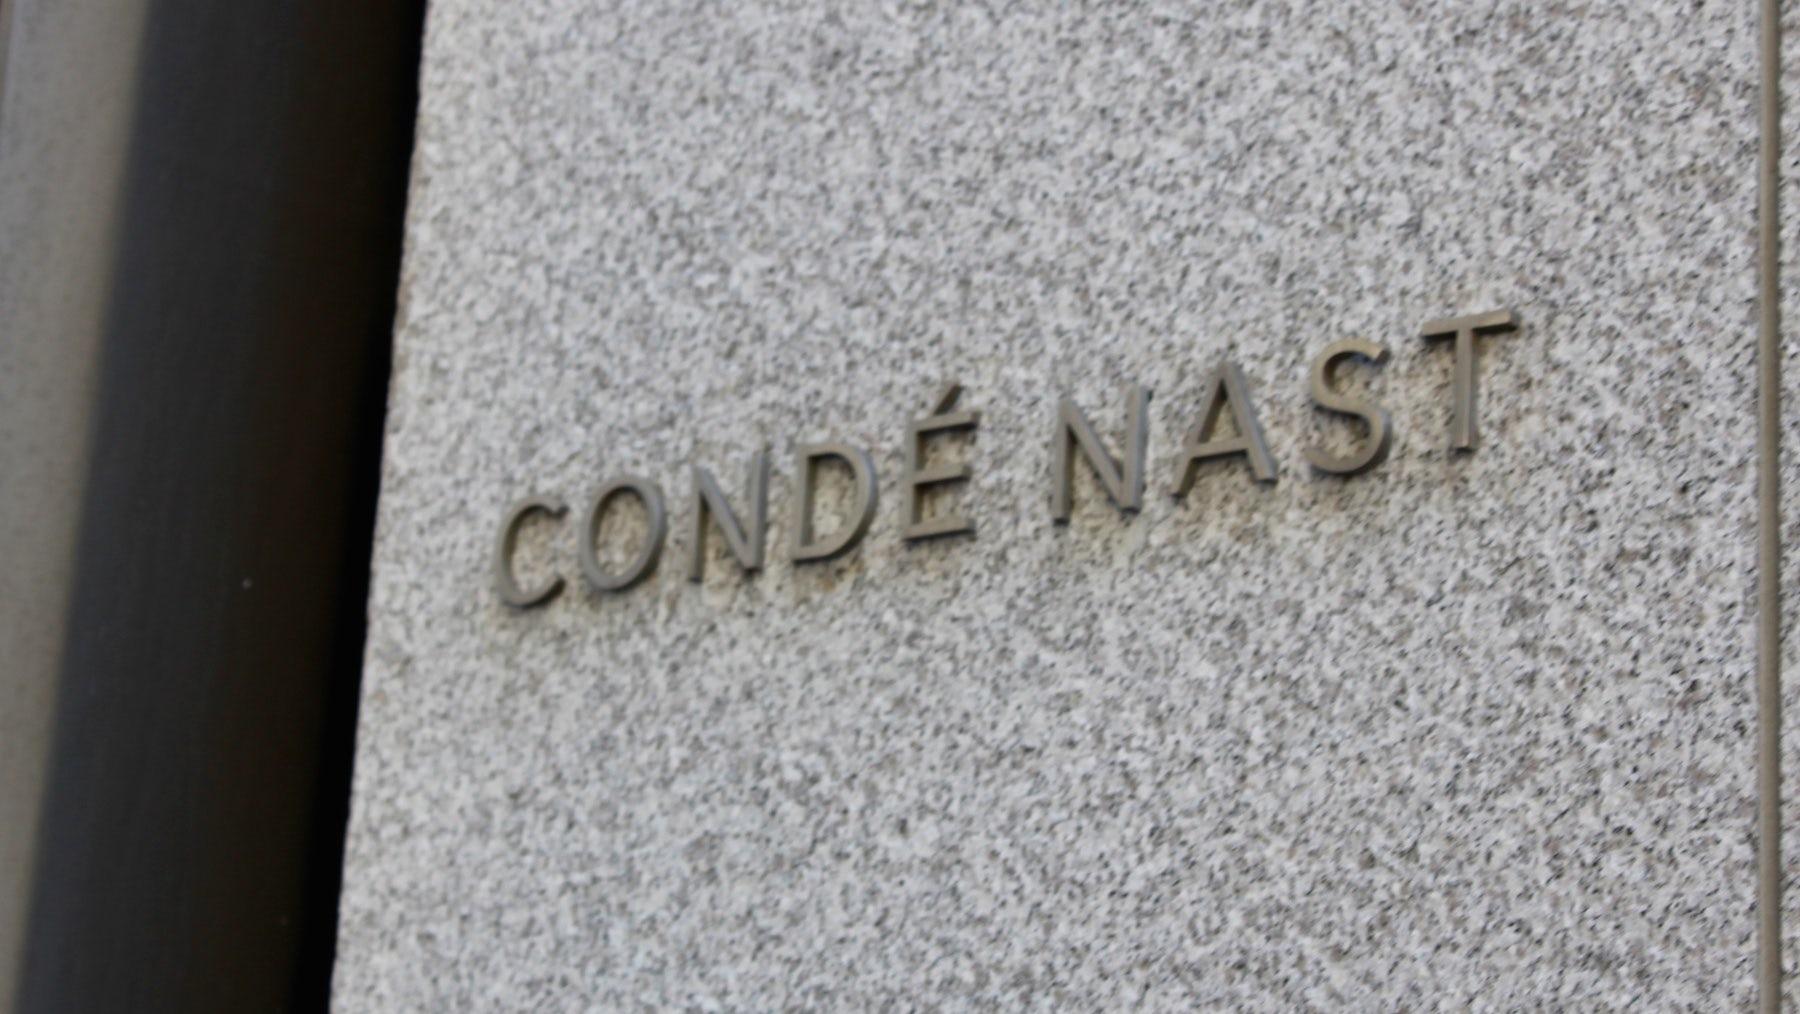 The Condé Nast headquarters at One World Trade Center, New York   Source: Flickr/ShinyaSuzuki